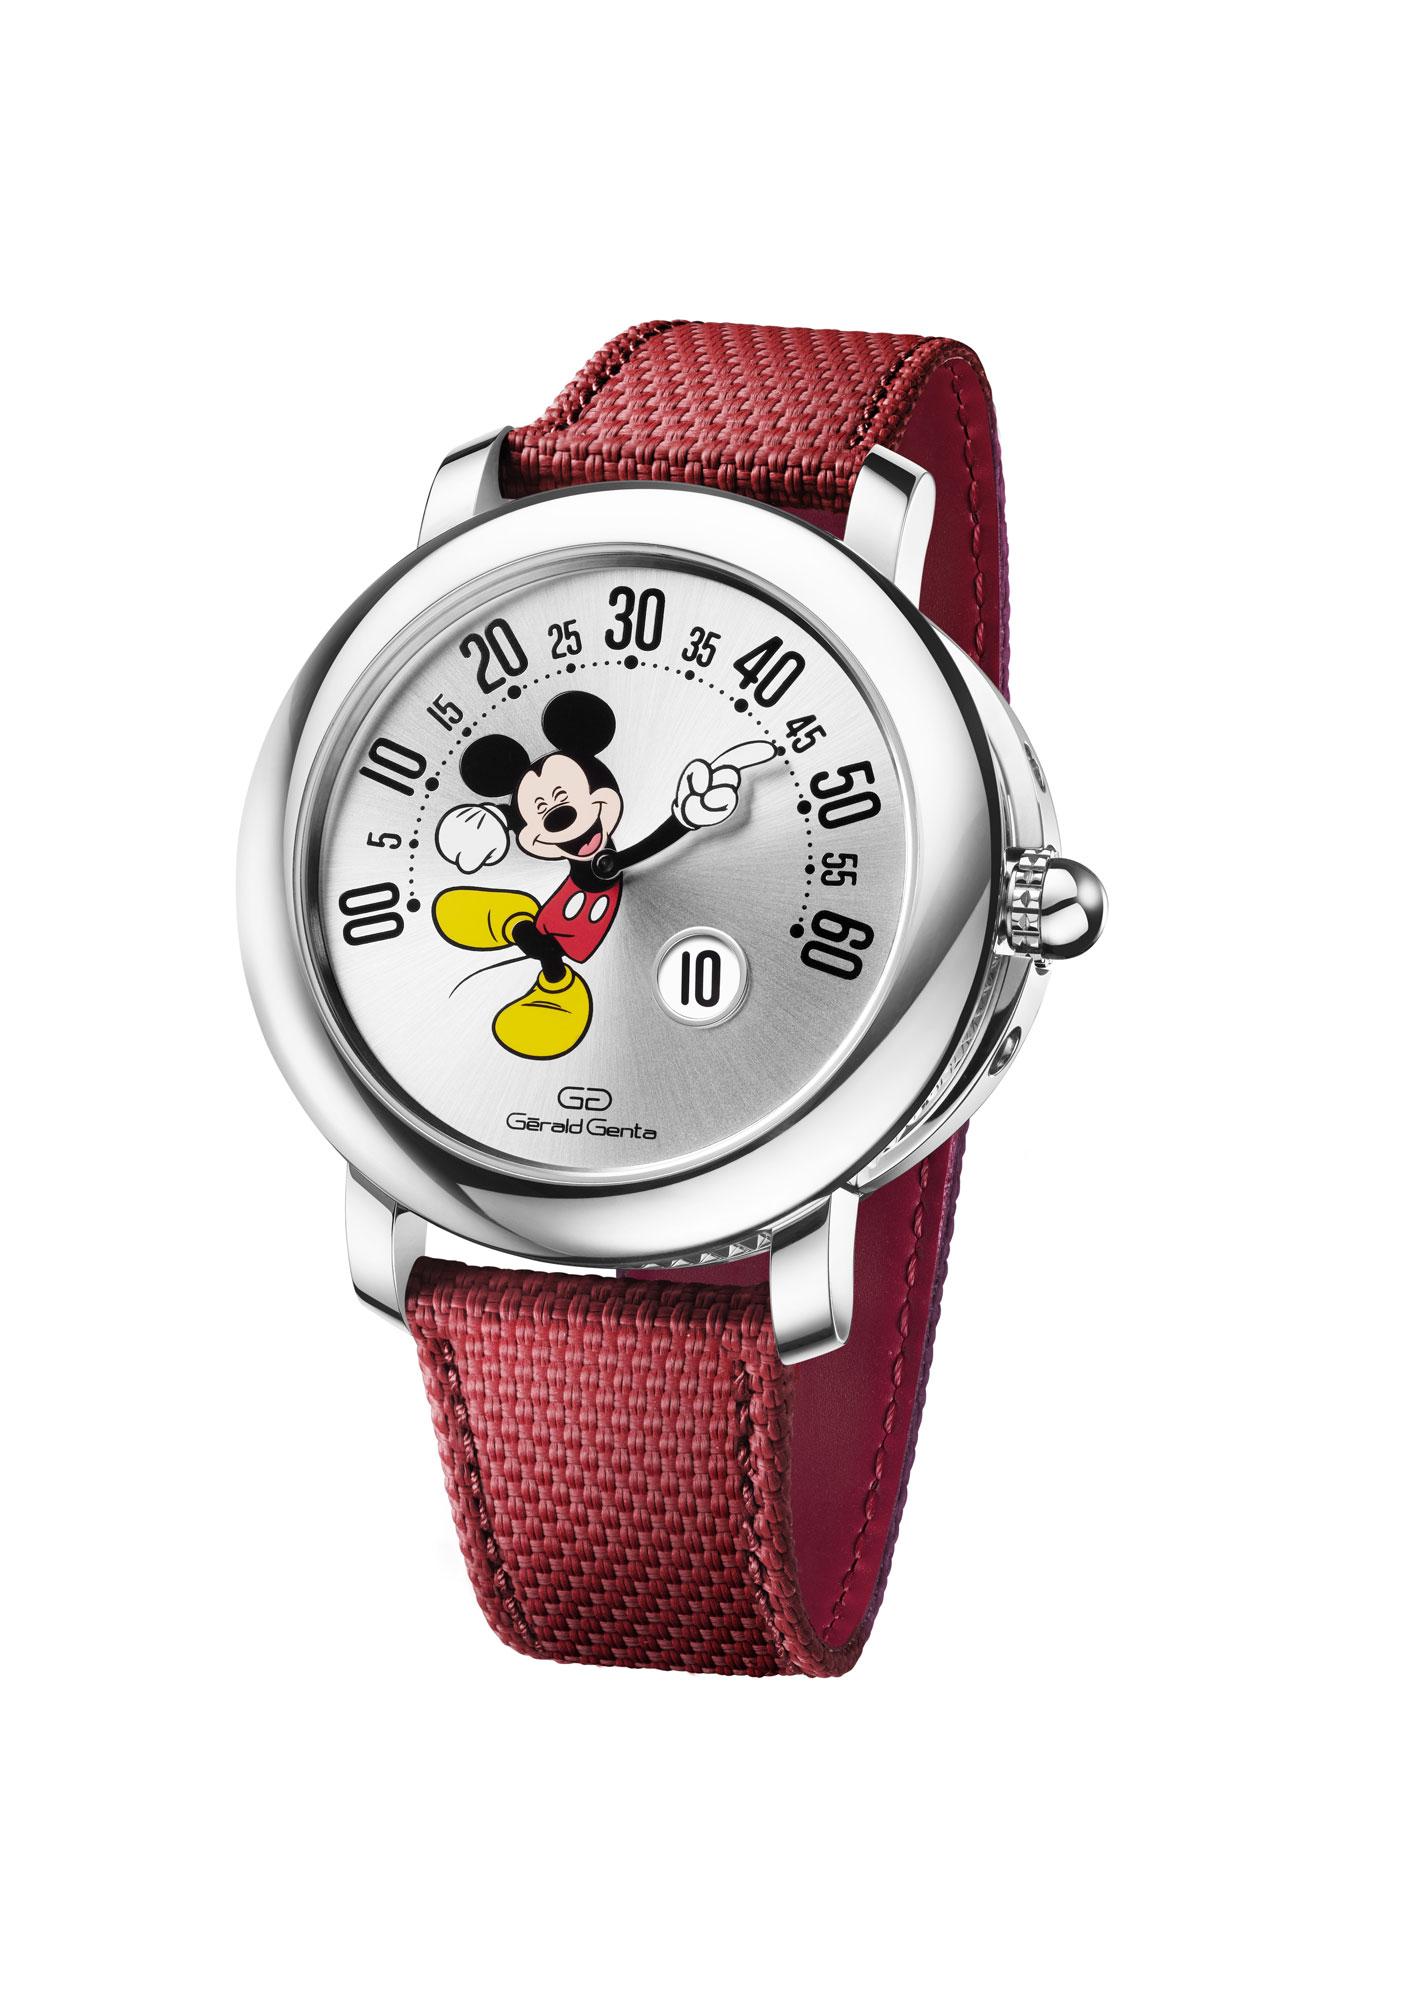 Gérald Genta Arena Retrograde With Smiling Disney Mickey Mouse - Ref. 103613